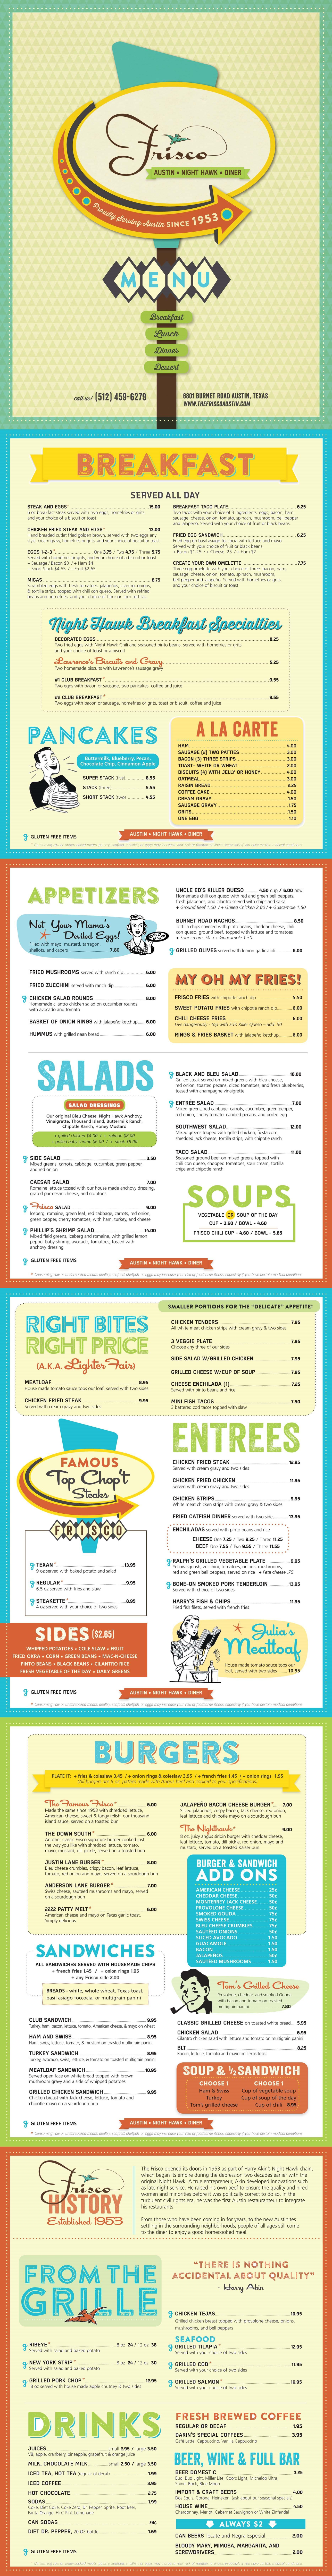 menu2015copy.jpg